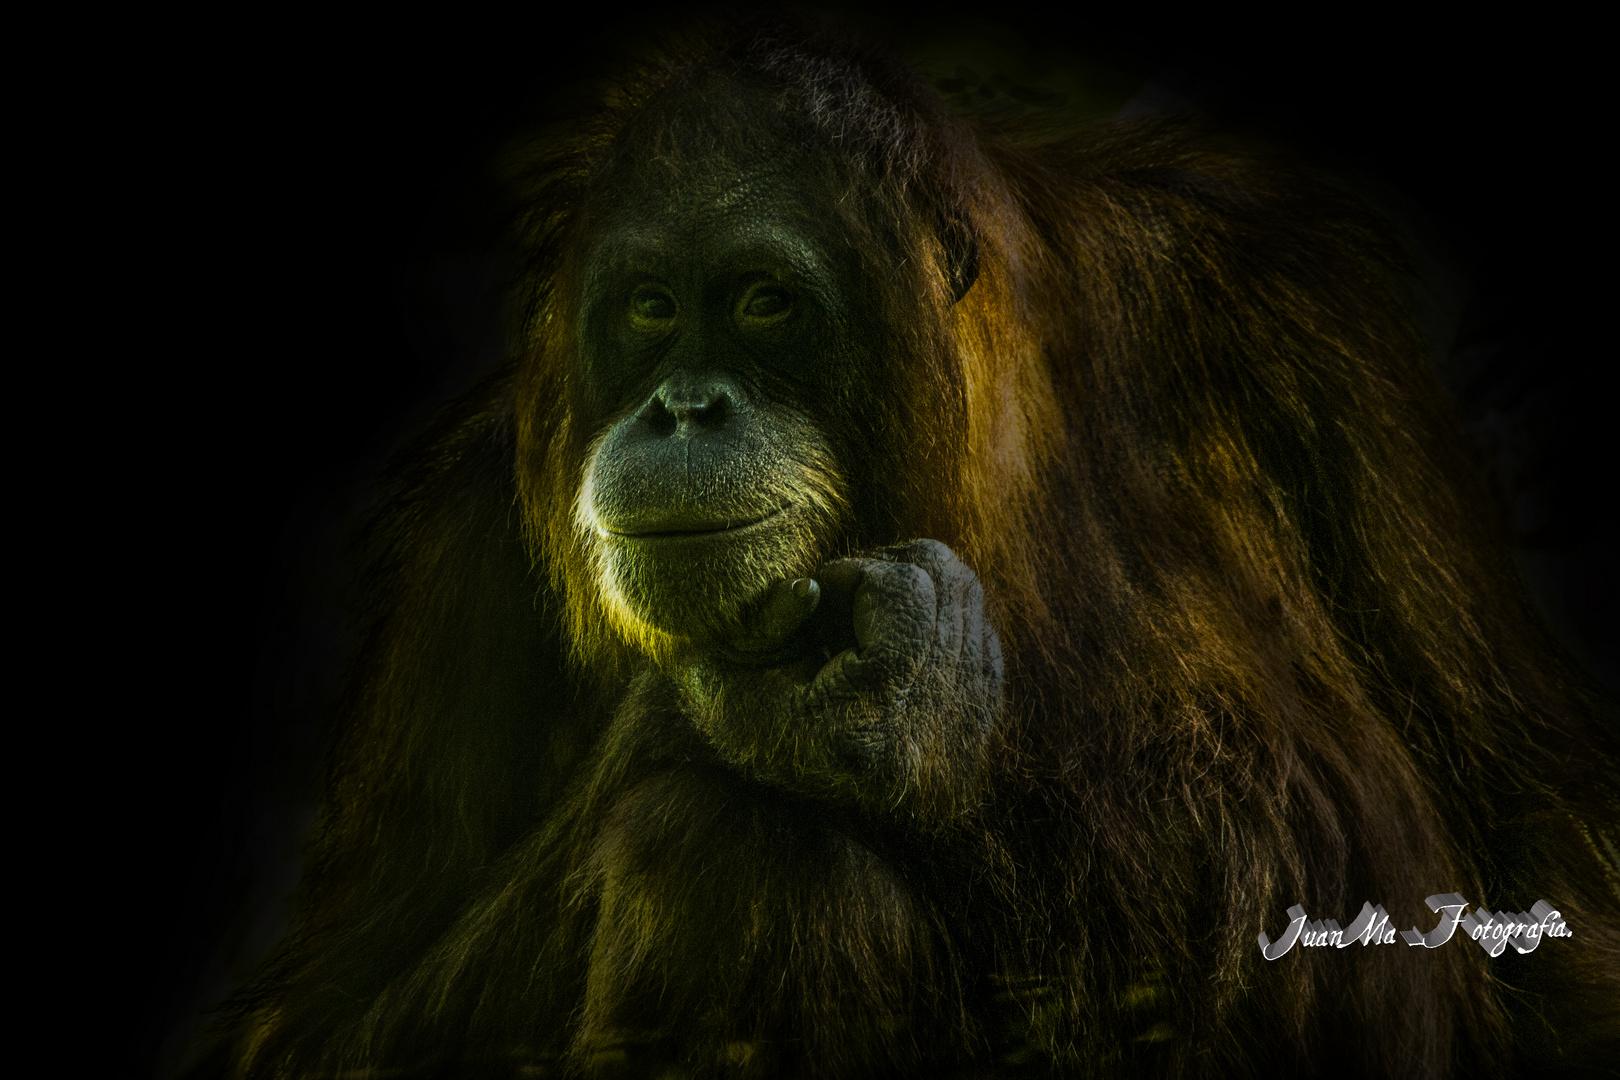 Inteligencia animal: Orangután.